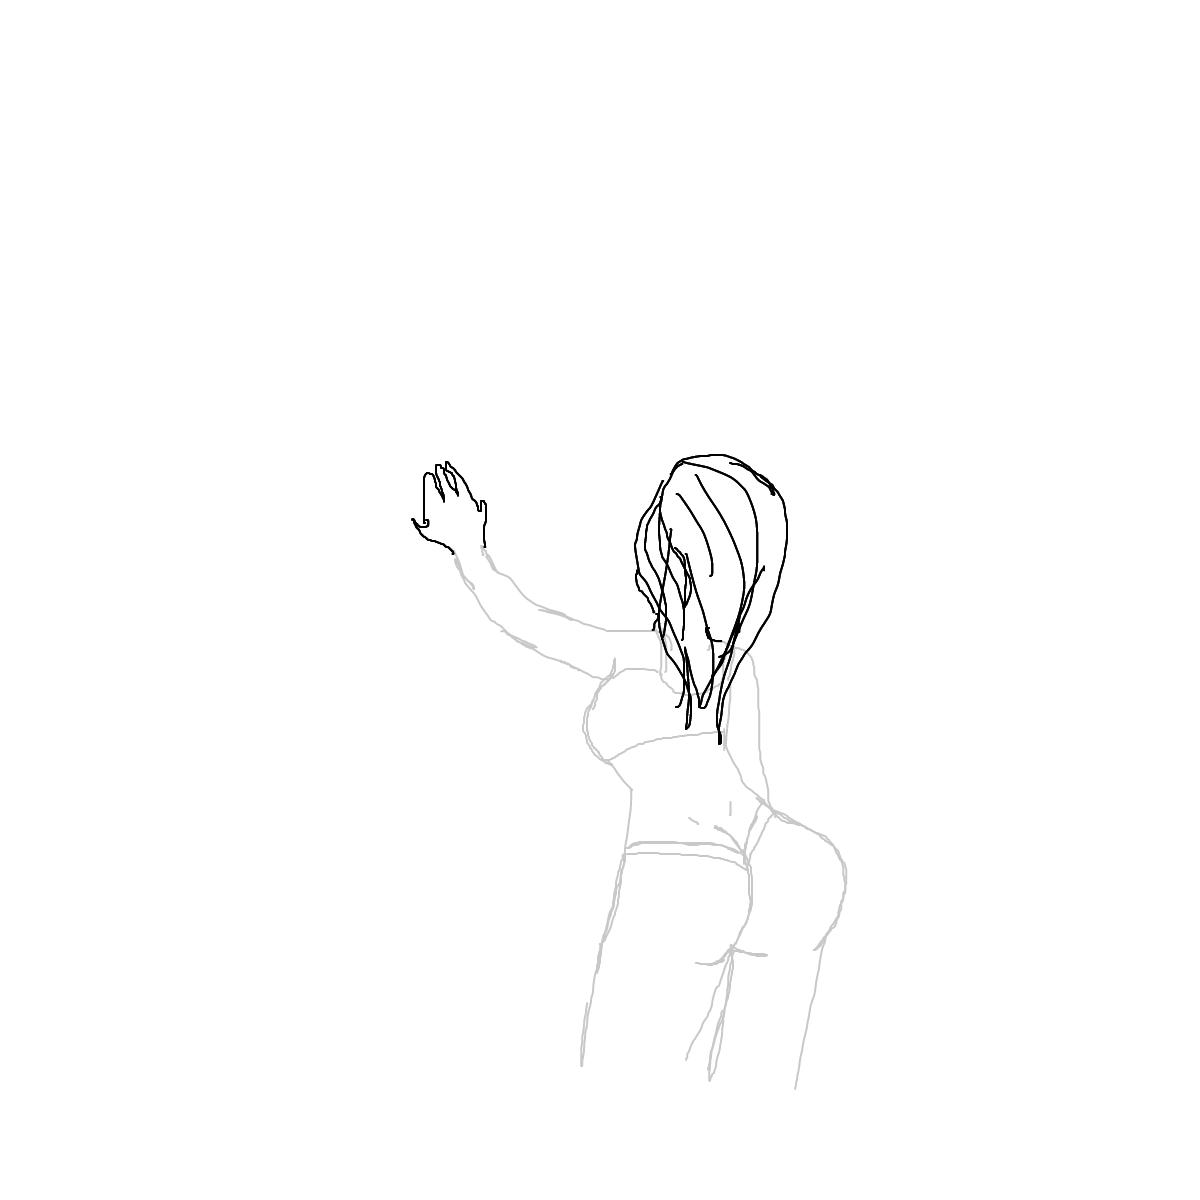 BAAAM drawing#24638 lat:52.6130714416503900lng: -2.8259763717651367